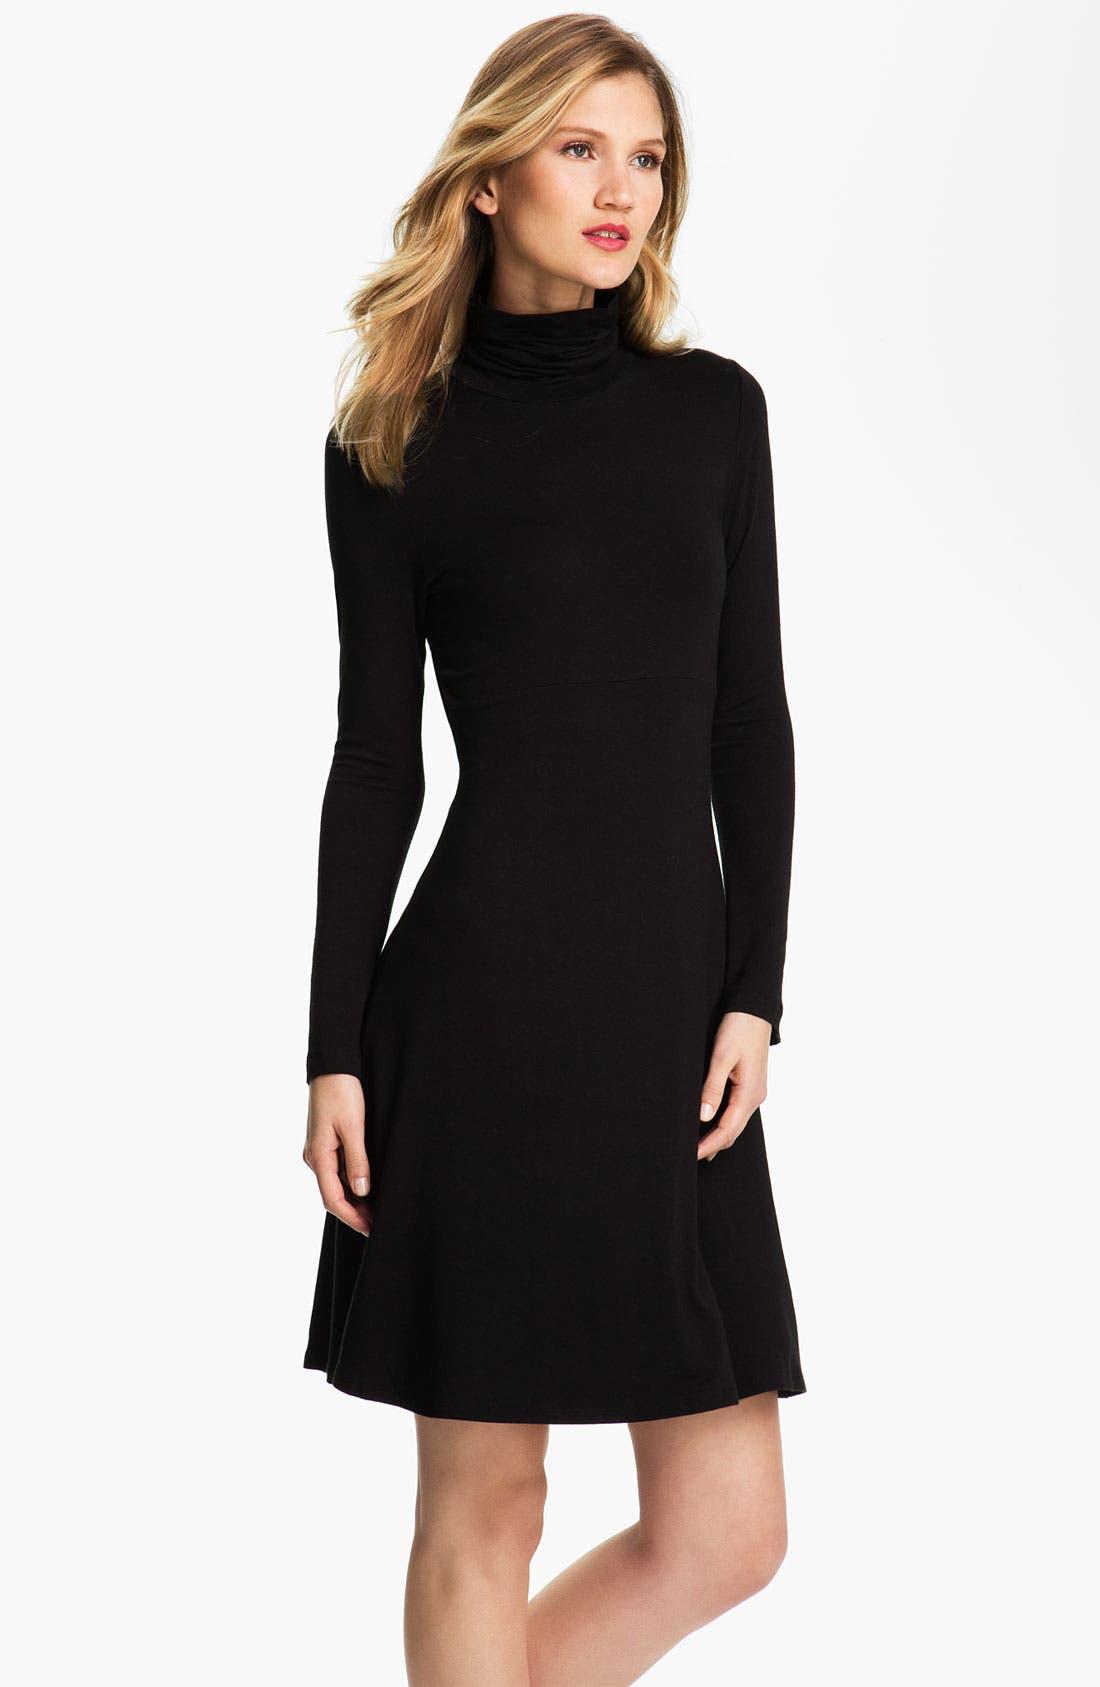 Alternate Image 1 Selected - Karen Kane Turtleneck Dress